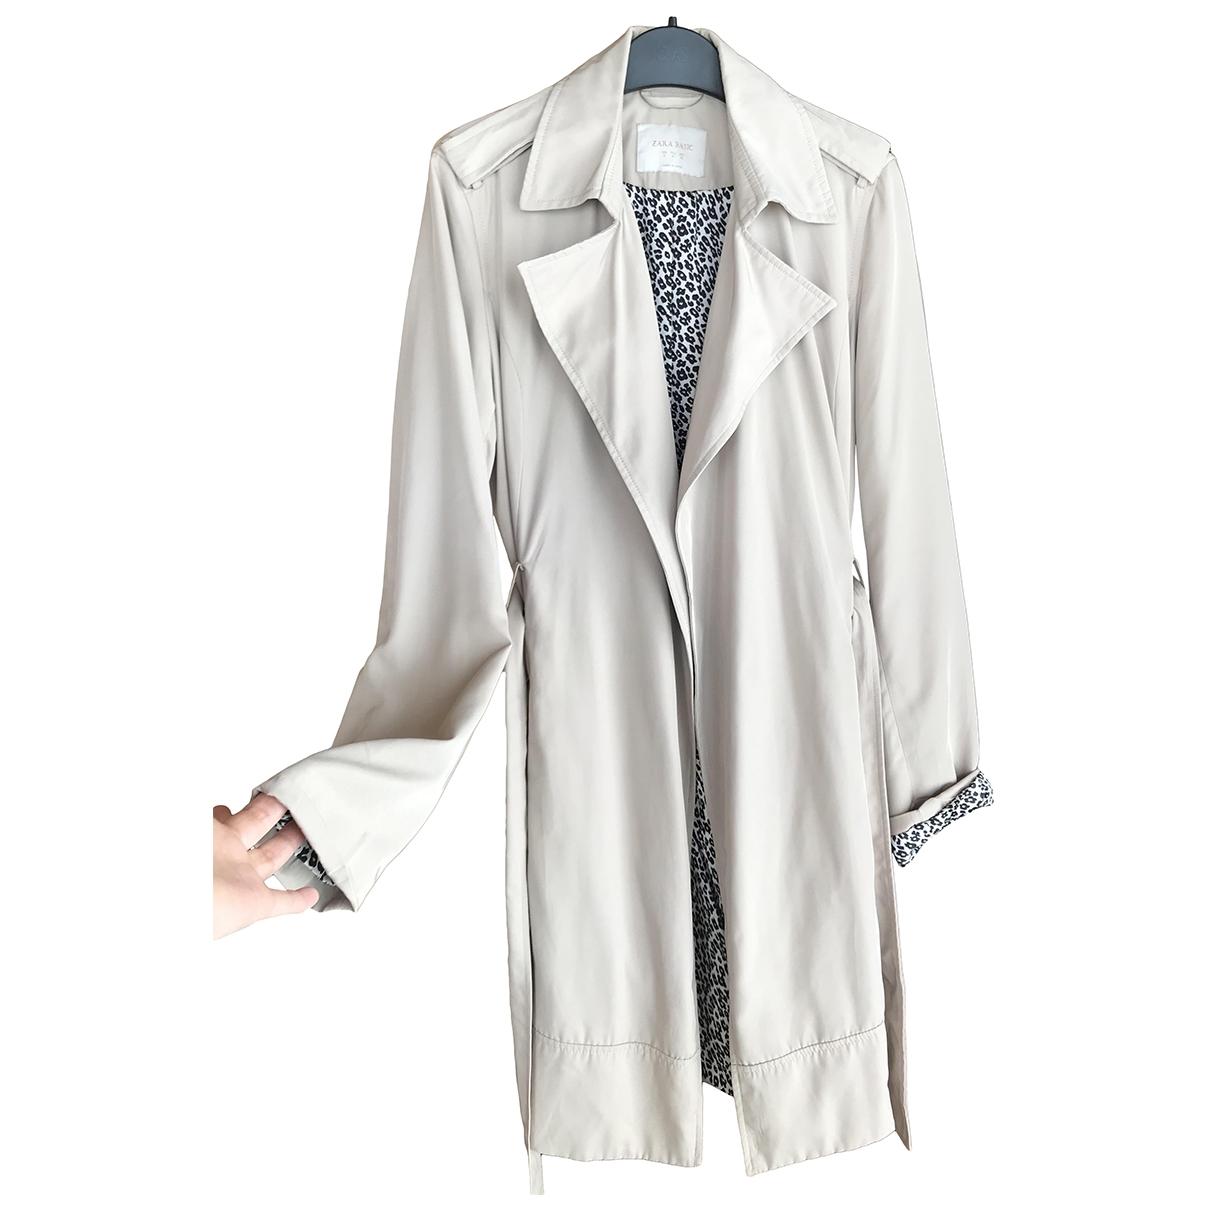 Zara \N Beige Trench coat for Women M International